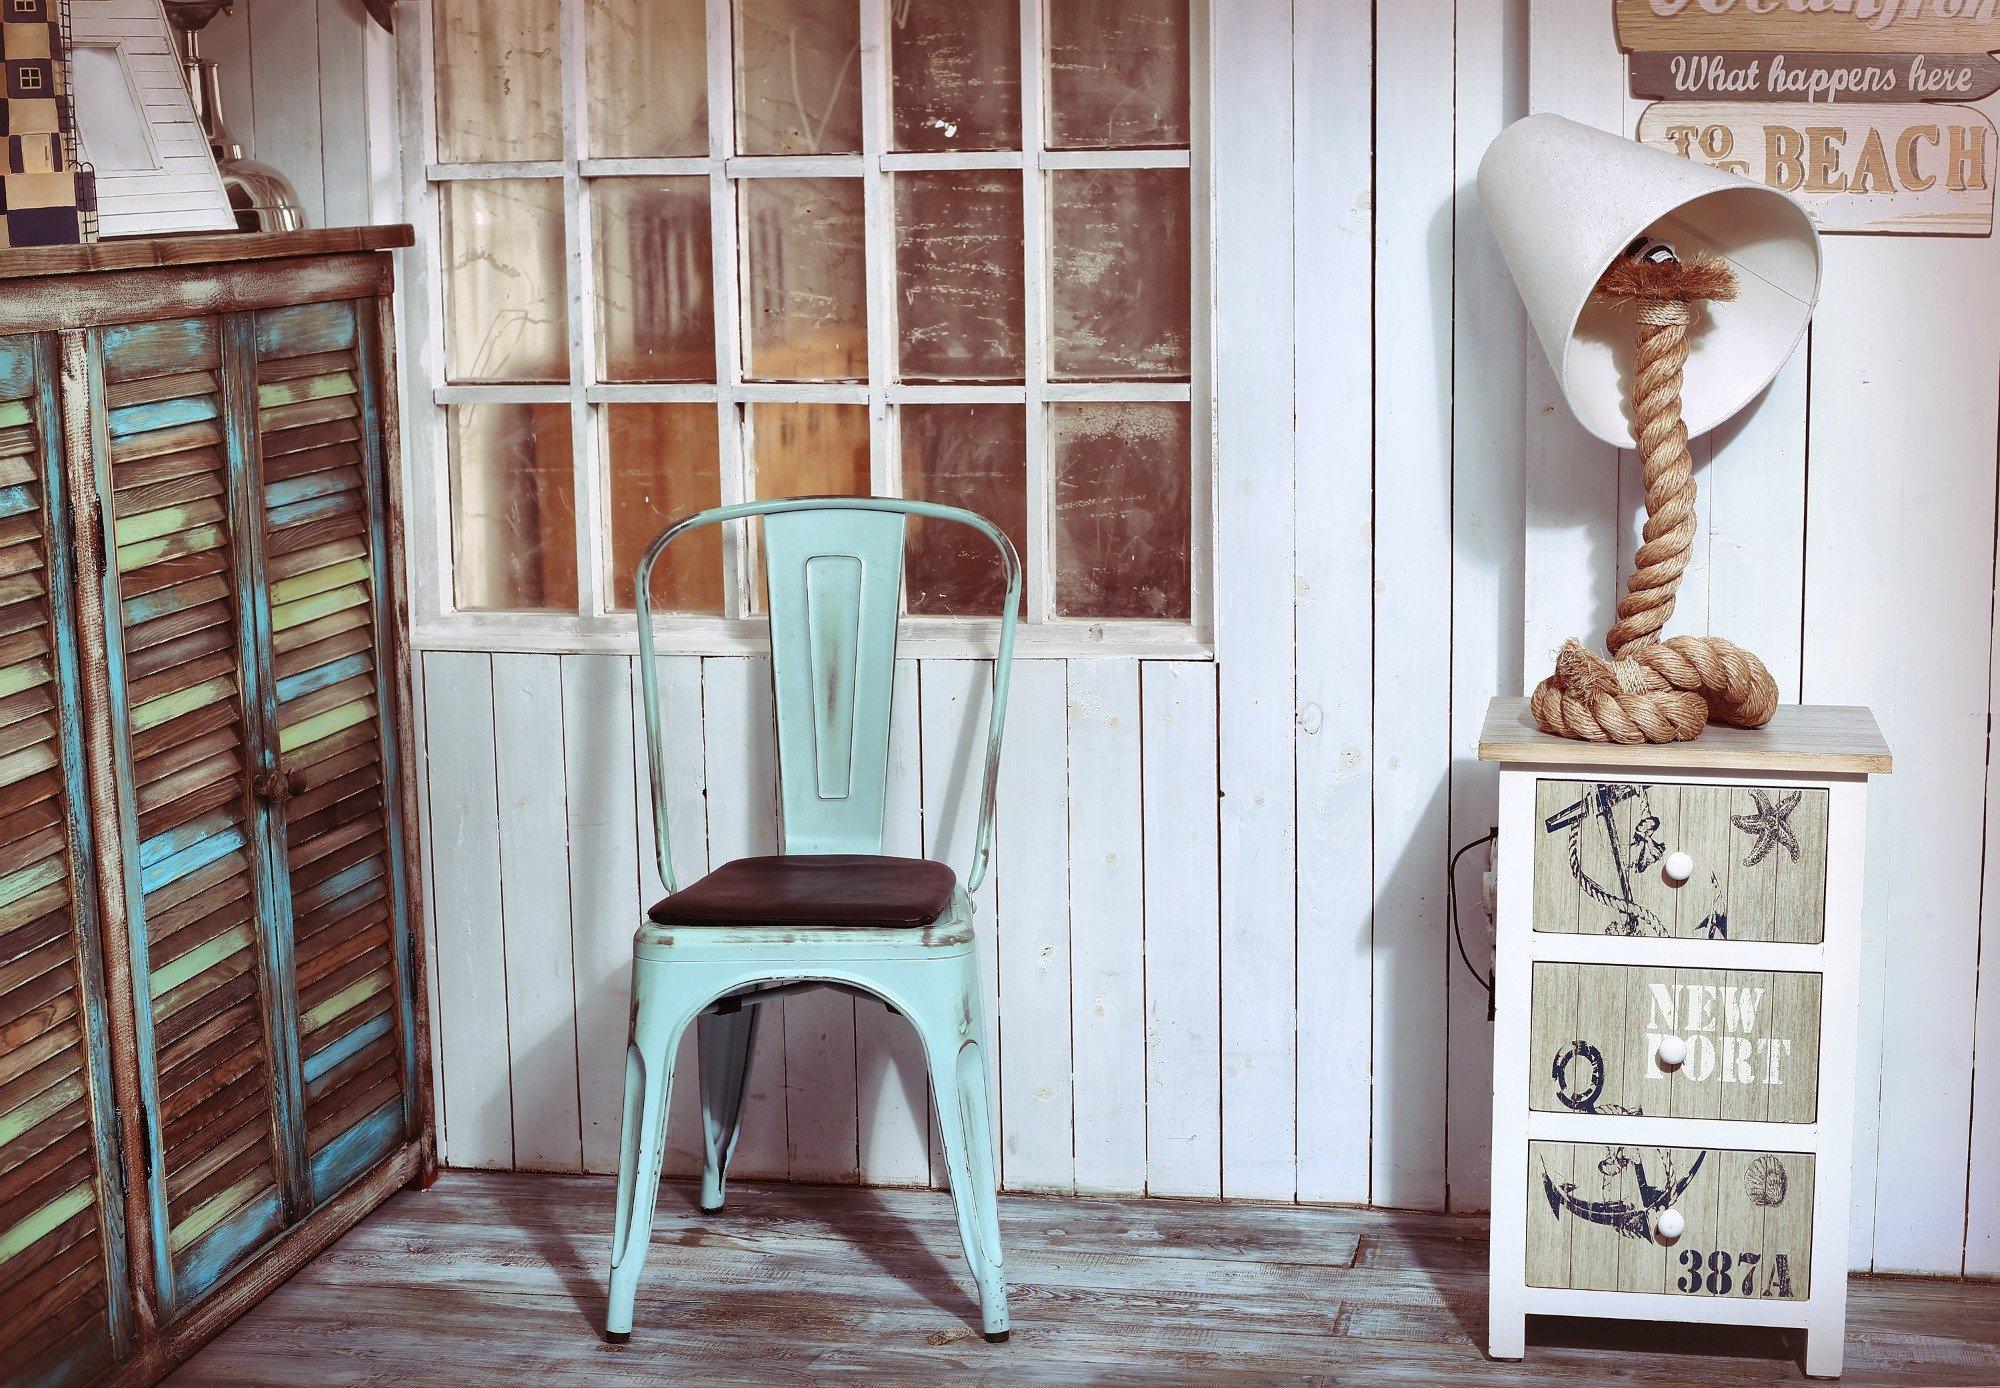 Trendy Designs Using Reclaimed Wood